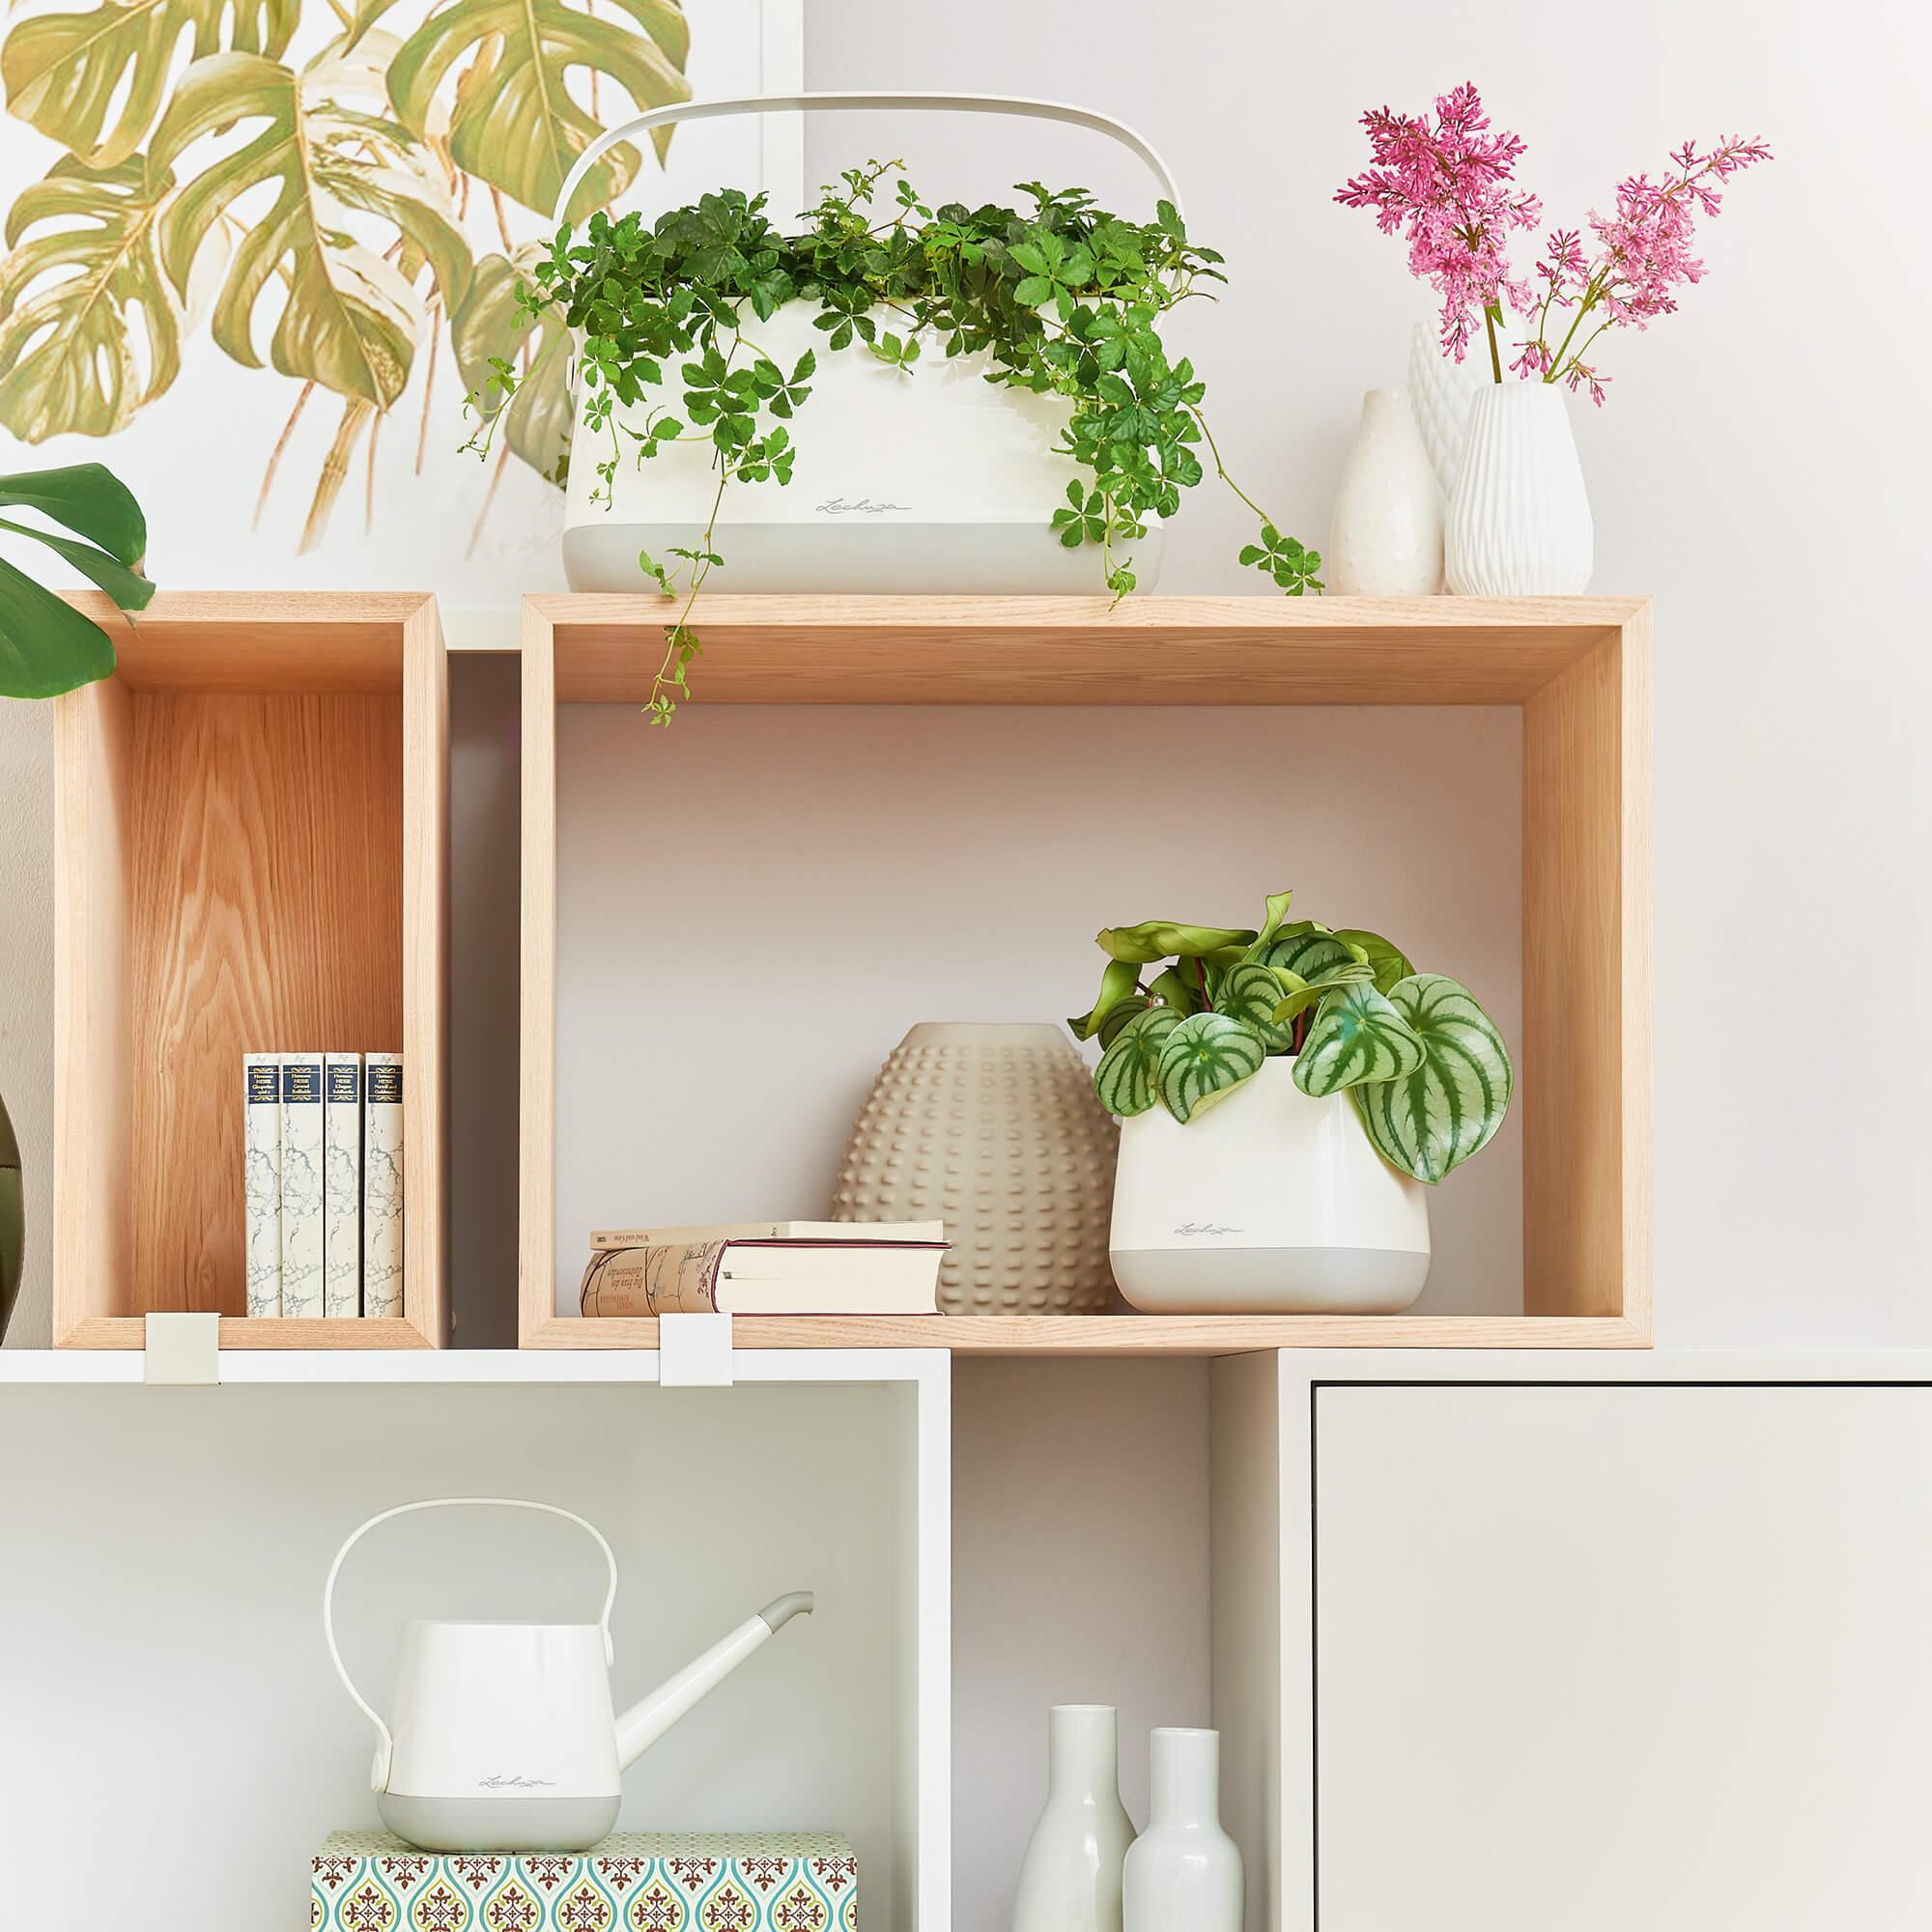 YULA plant bag white/gray semi-gloss - Image 9